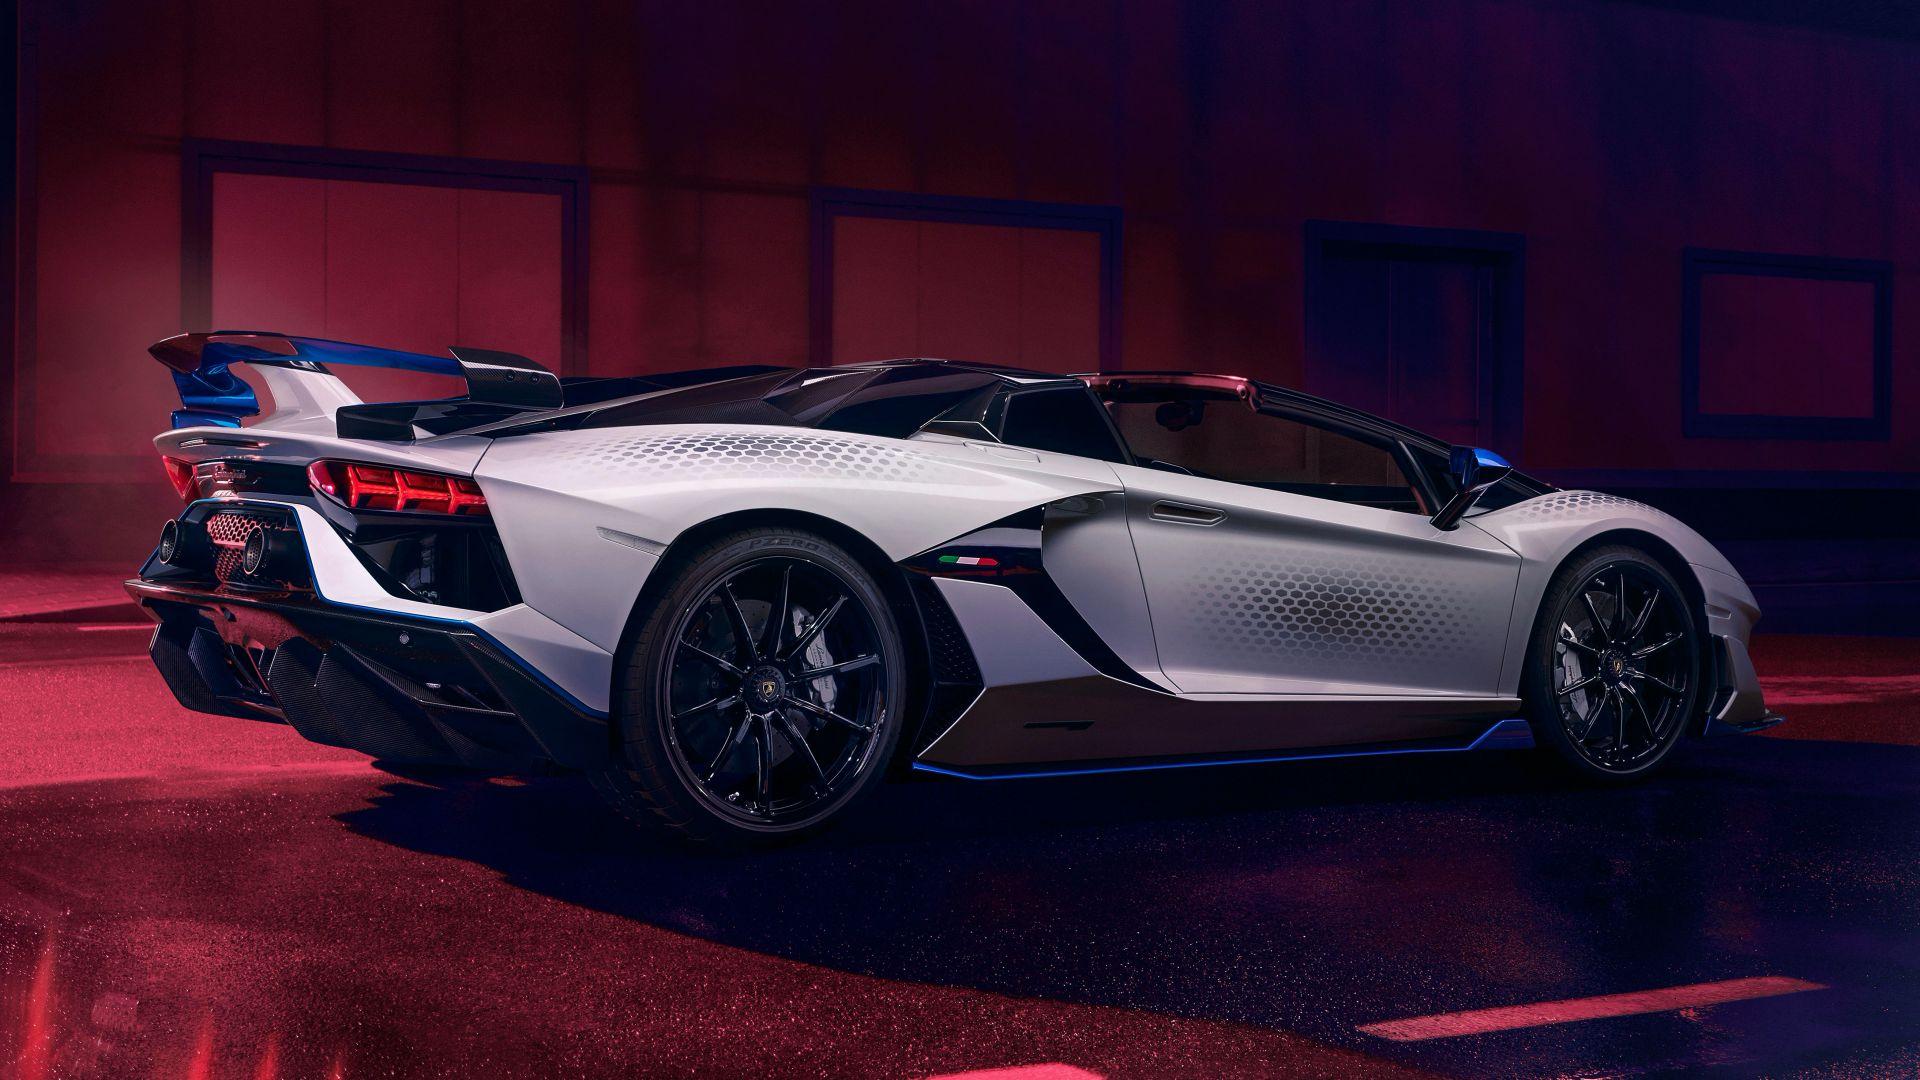 Lamborghini-Aventador-SVJ-Xago-Edition-2